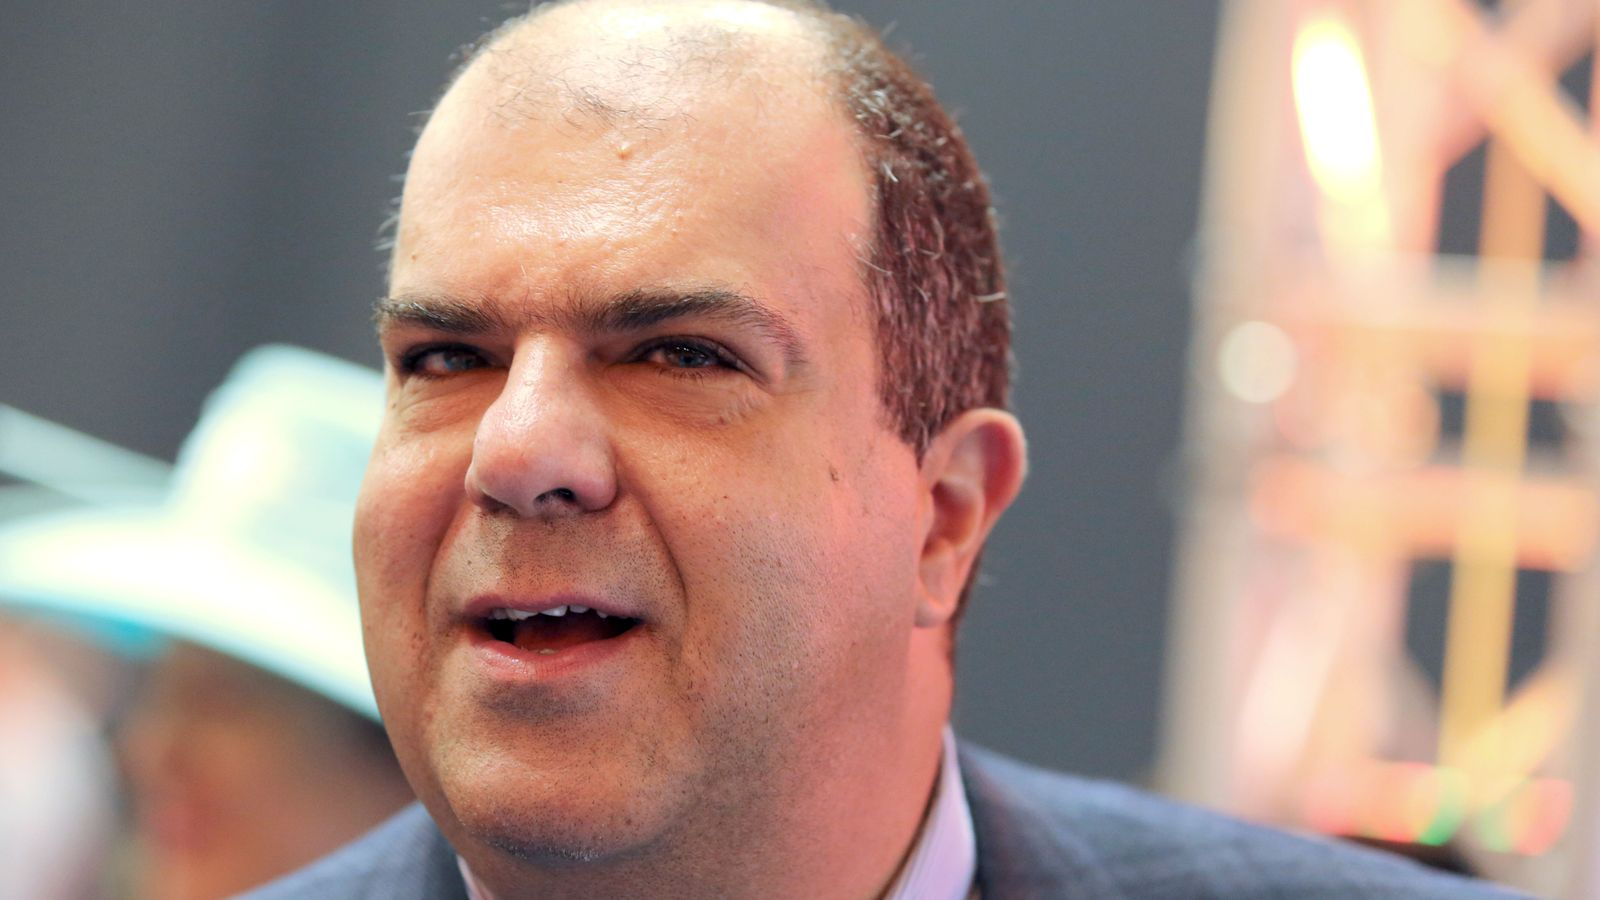 Coronavirus: EasyJet founder sells £13m stake amid row